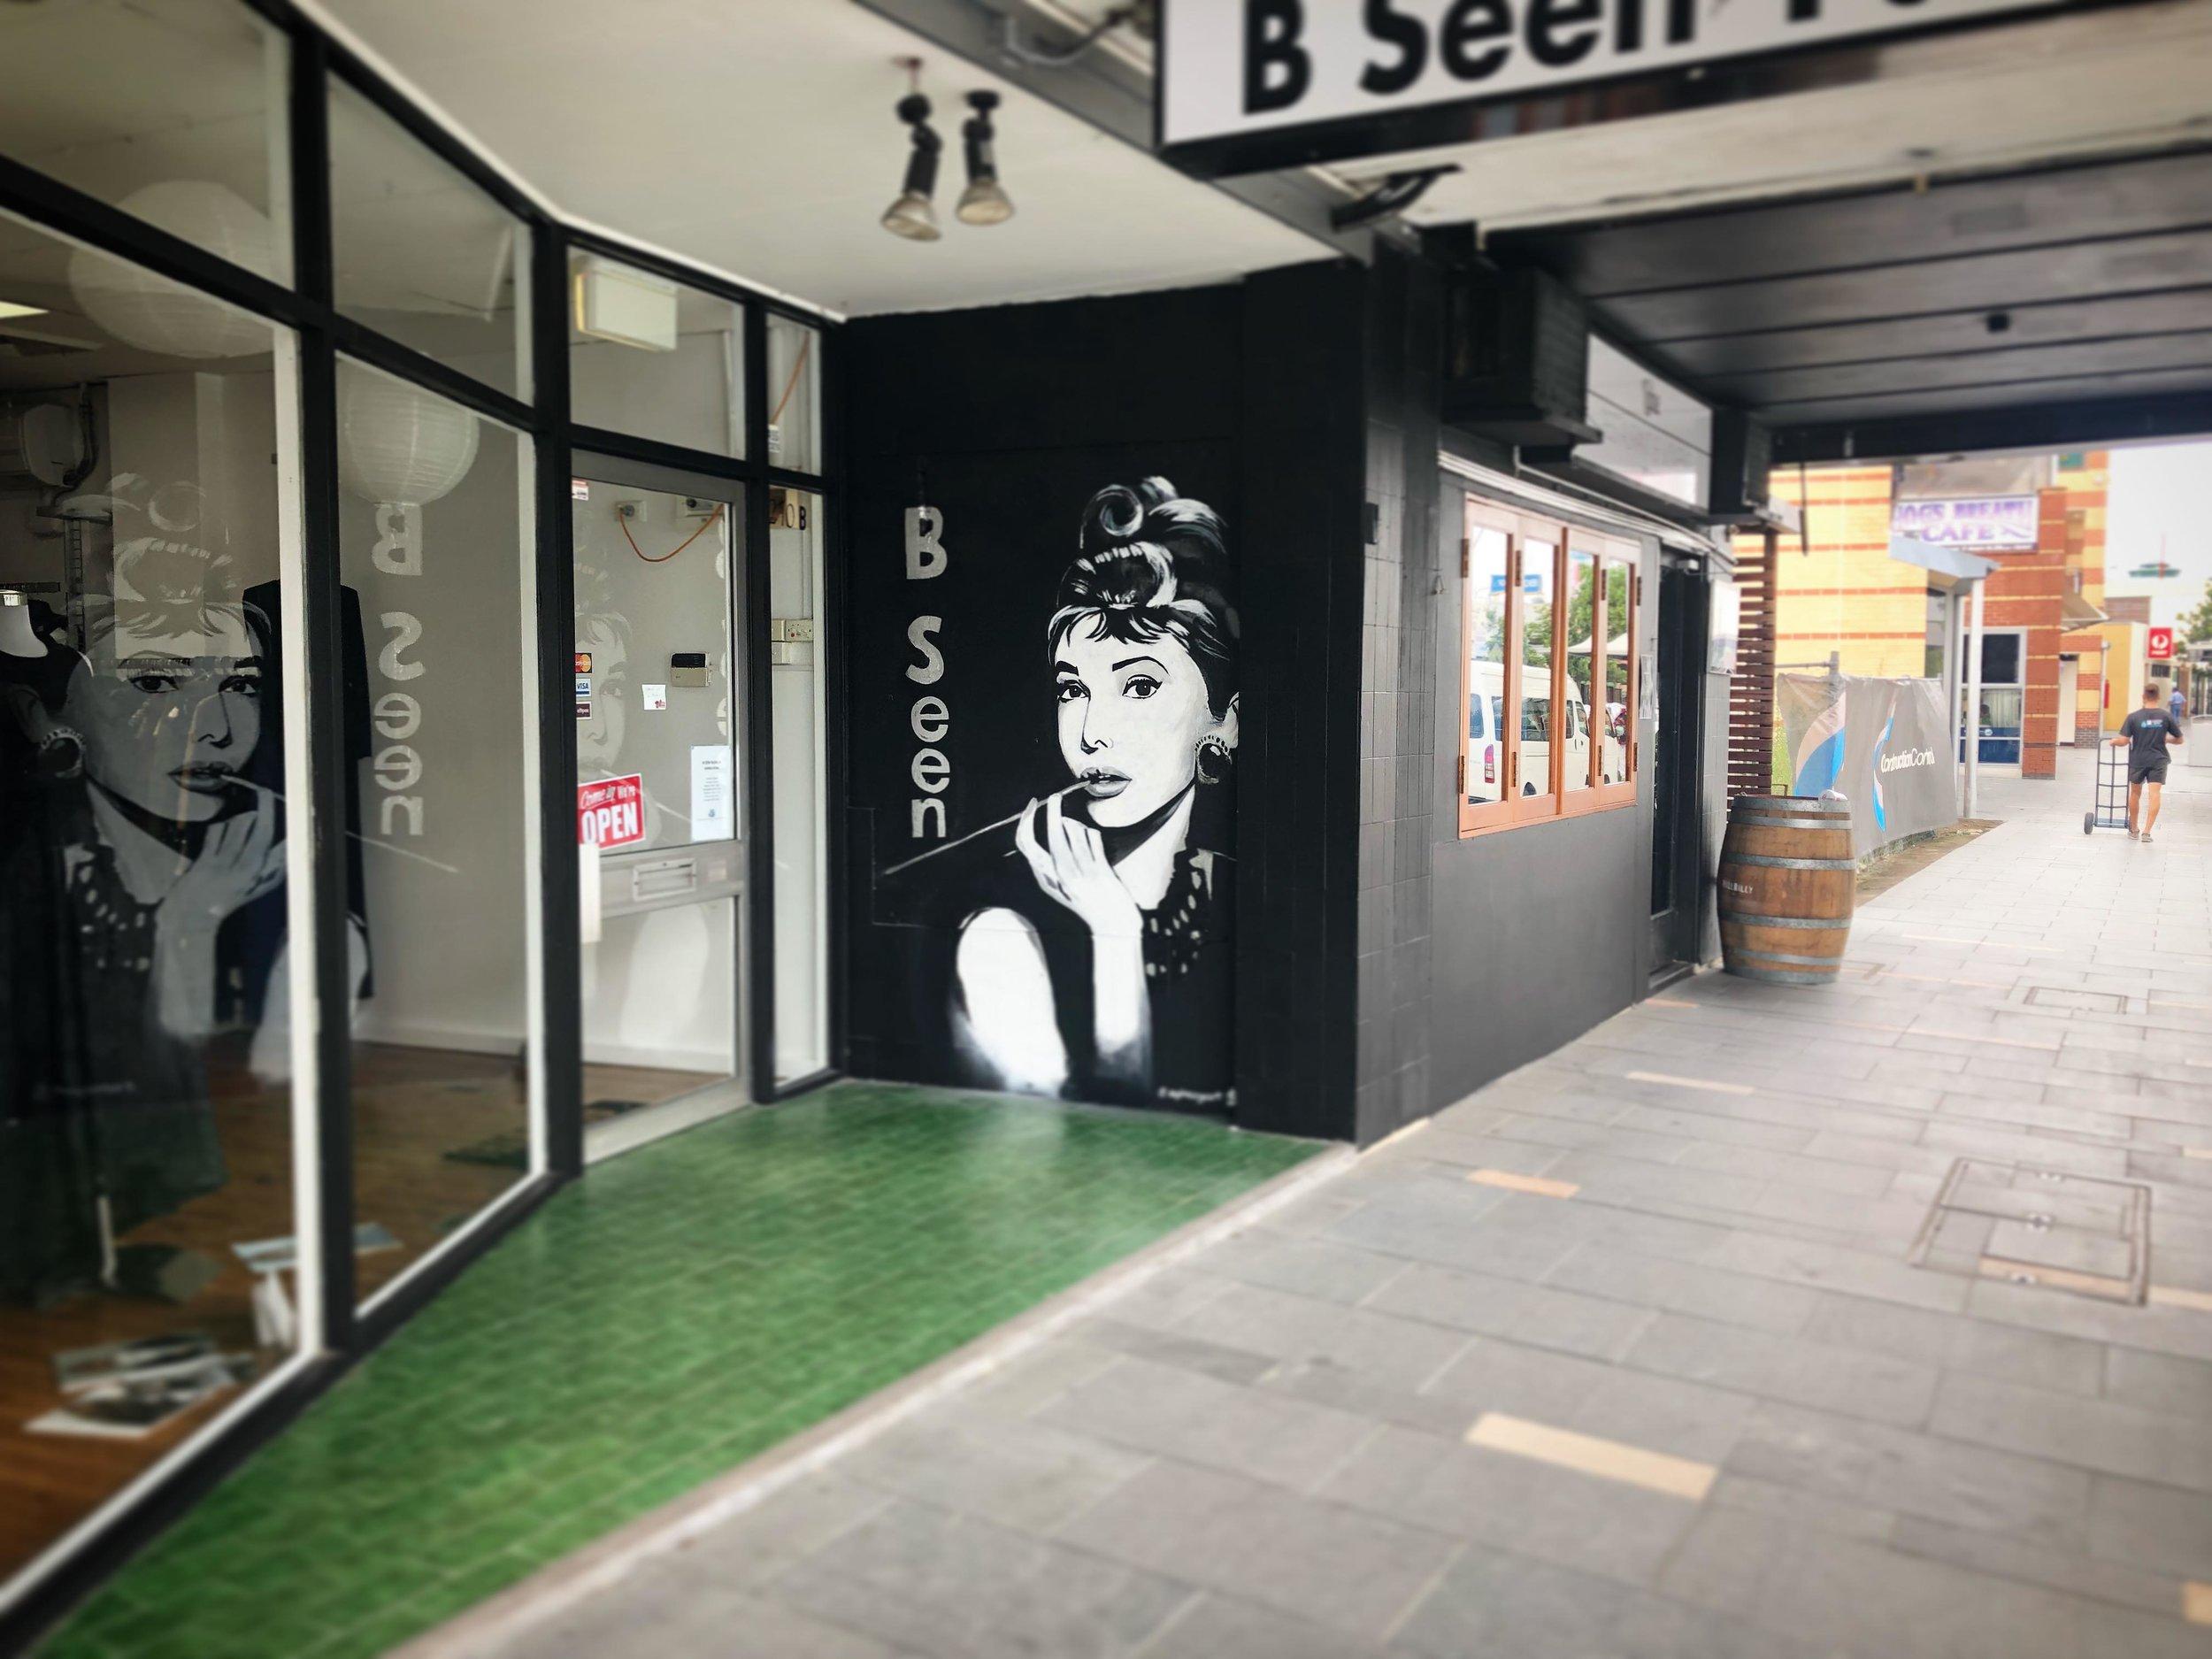 Mural for B Seen Fashion, 2018